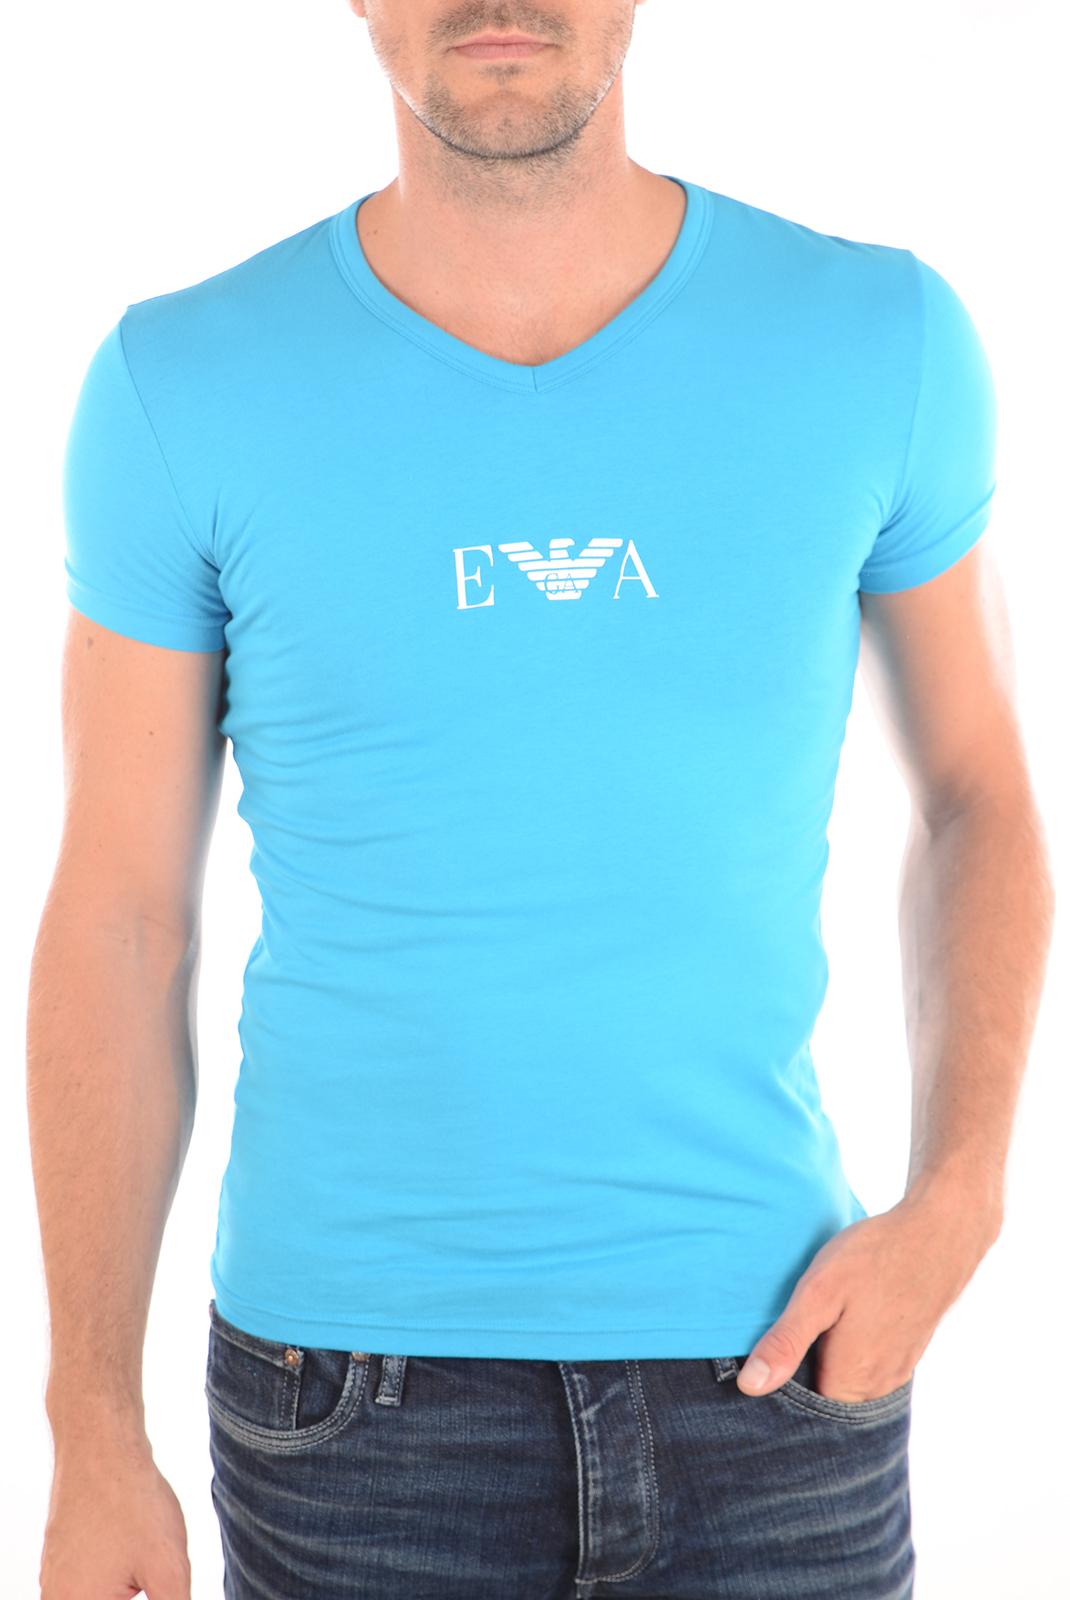 Tee-shirts  Emporio armani 110810 6P715 0032 TURQUOISE